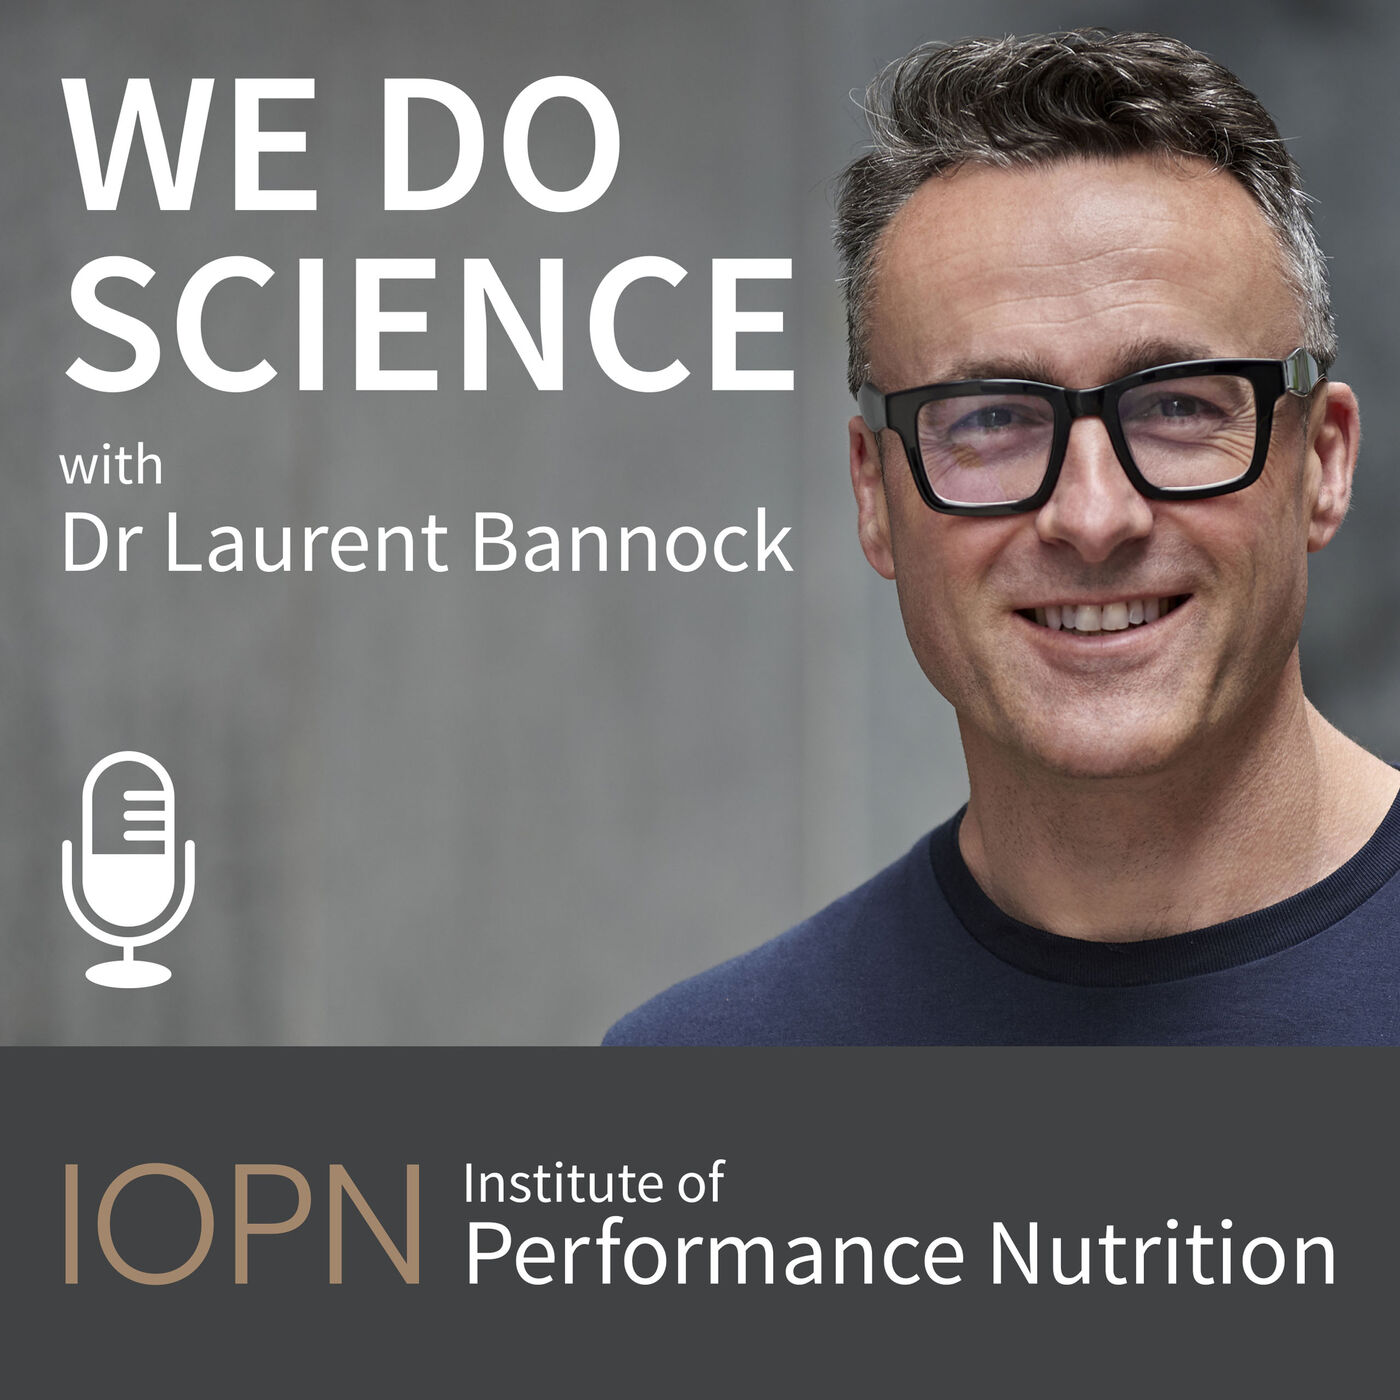 Episode 15 - 'Nutrition Coaching & Nutritional Agnosticism' with Brian Ste. Pierre MS RD CSCS